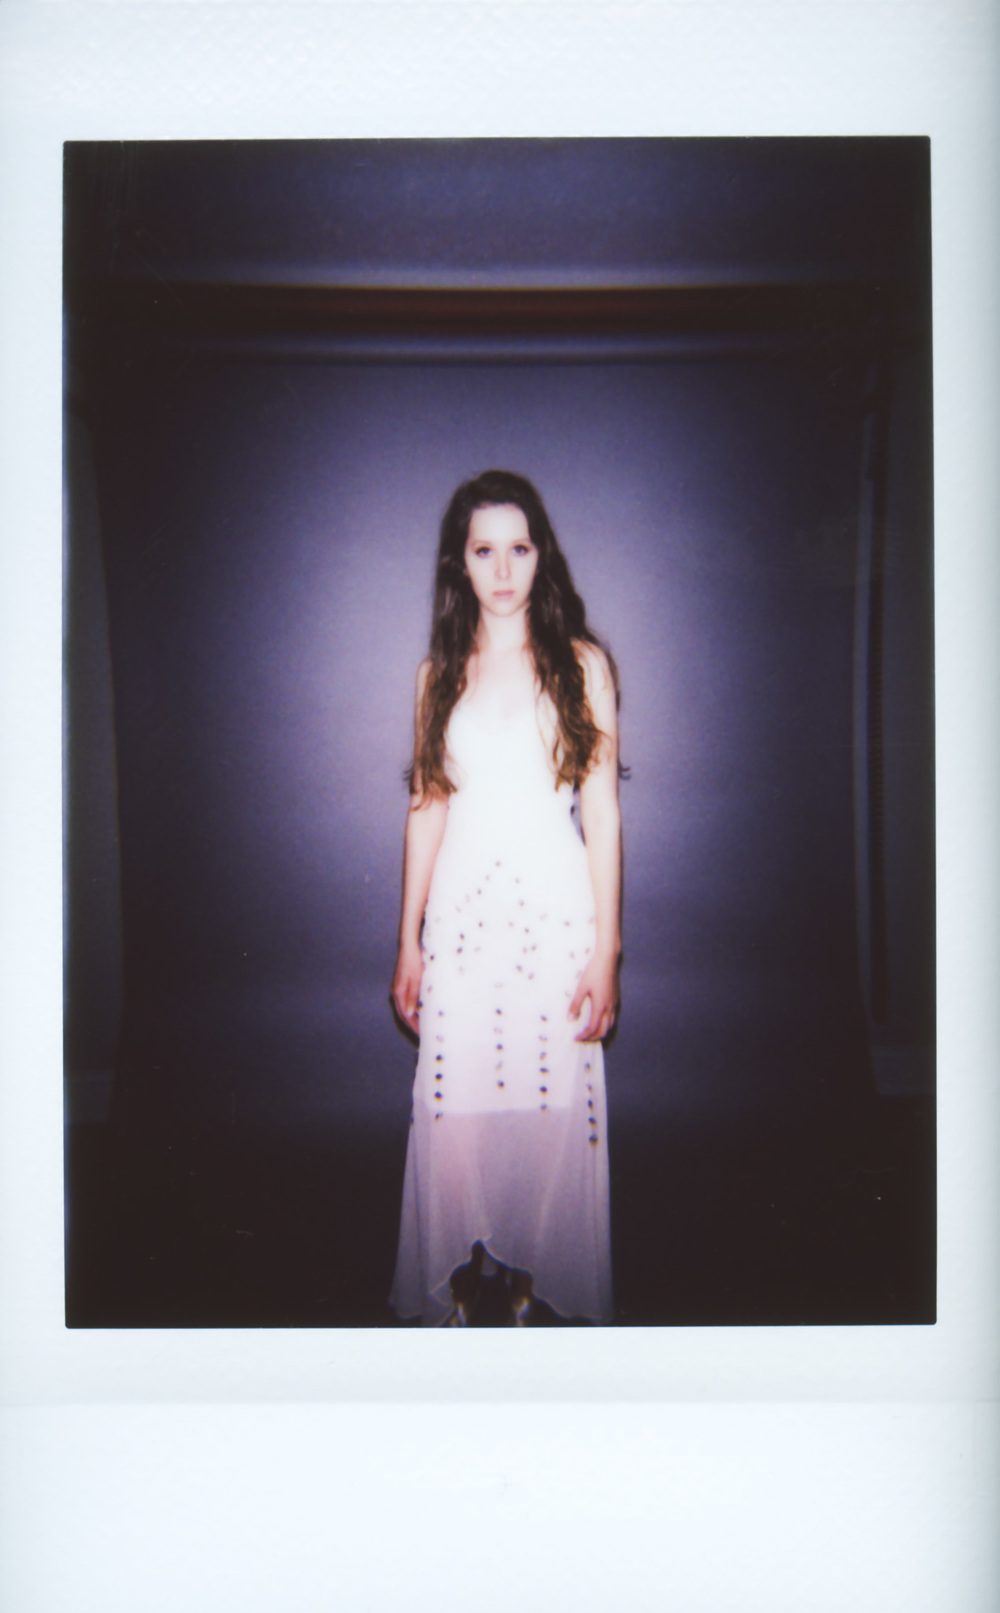 Model: Alexandra Petkus  Camera: lomo'instant  Film: Instax